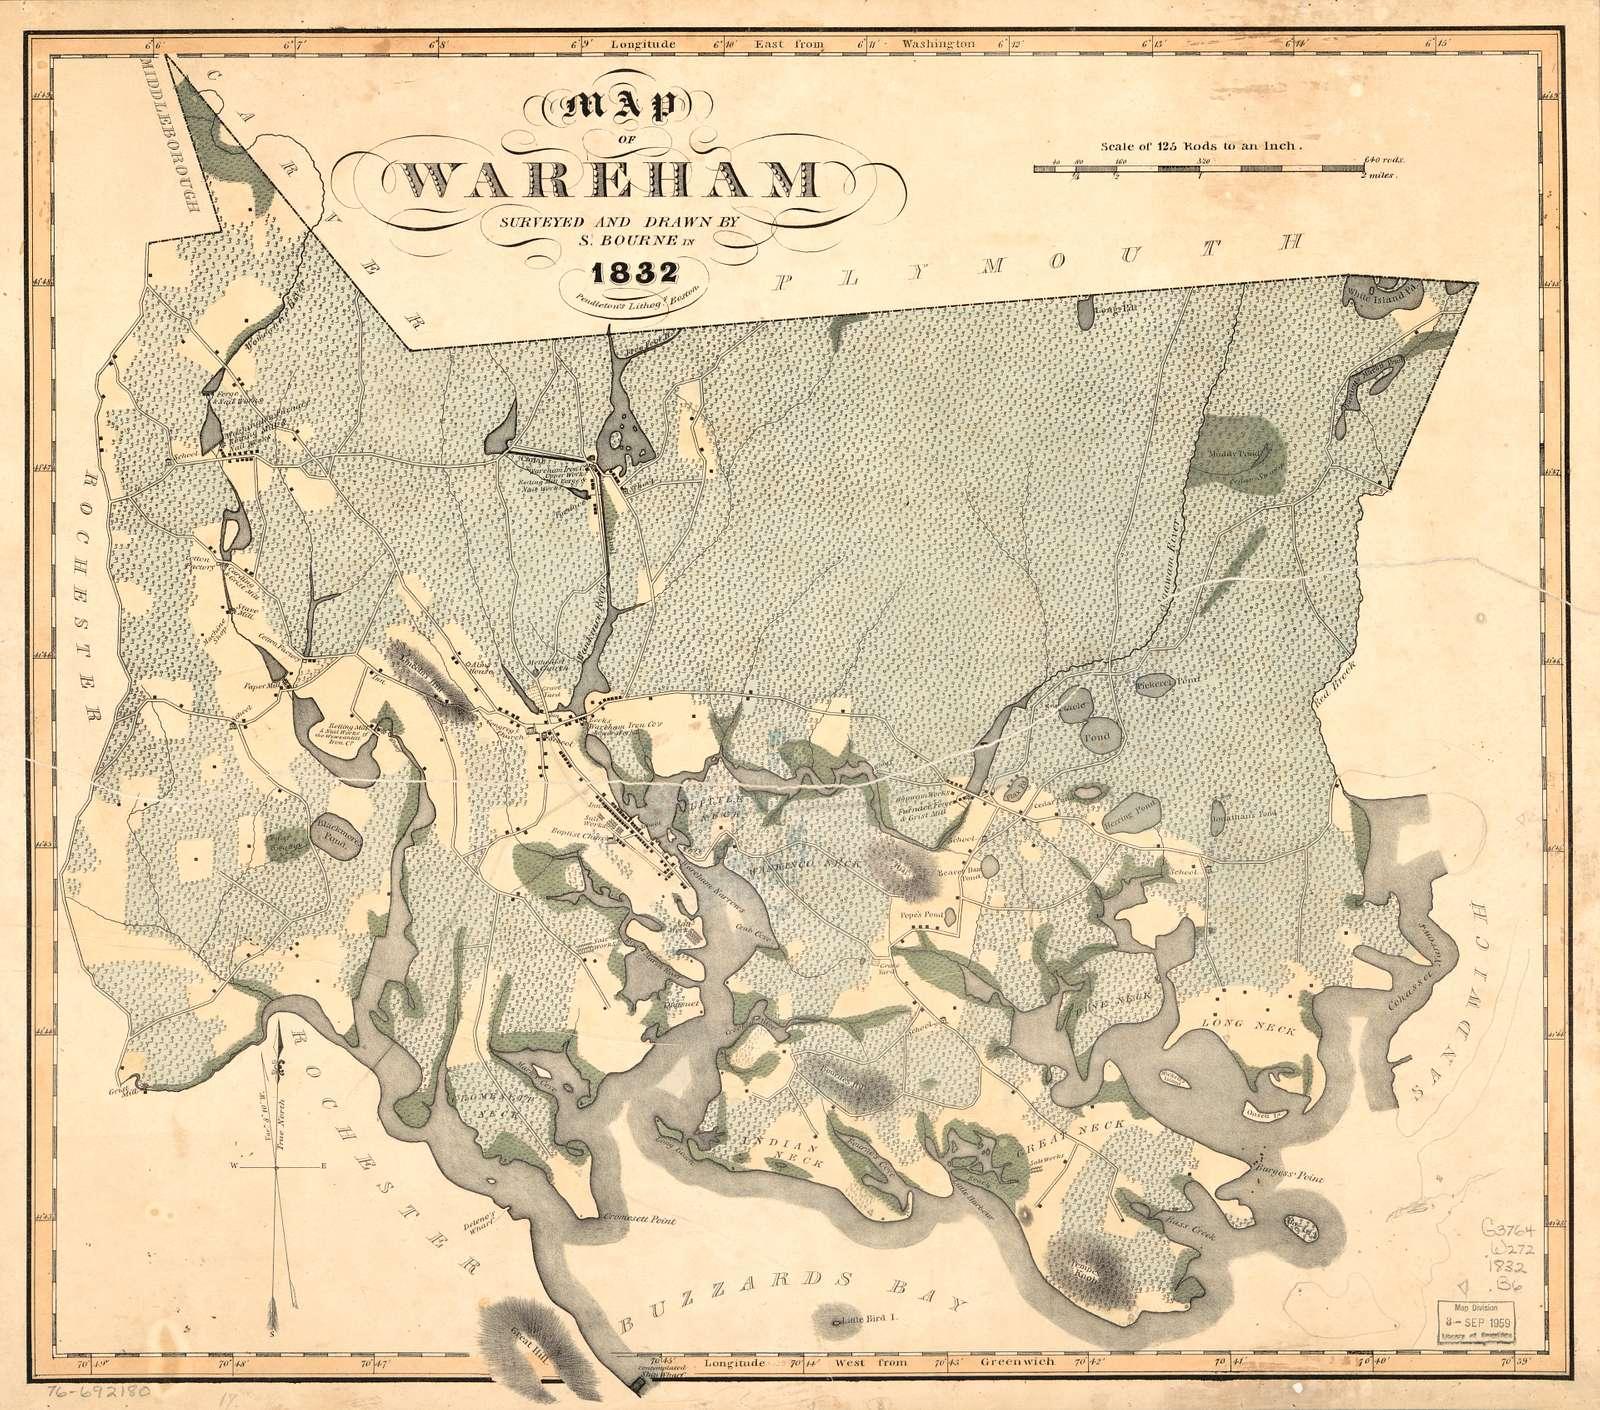 Map of Wareham